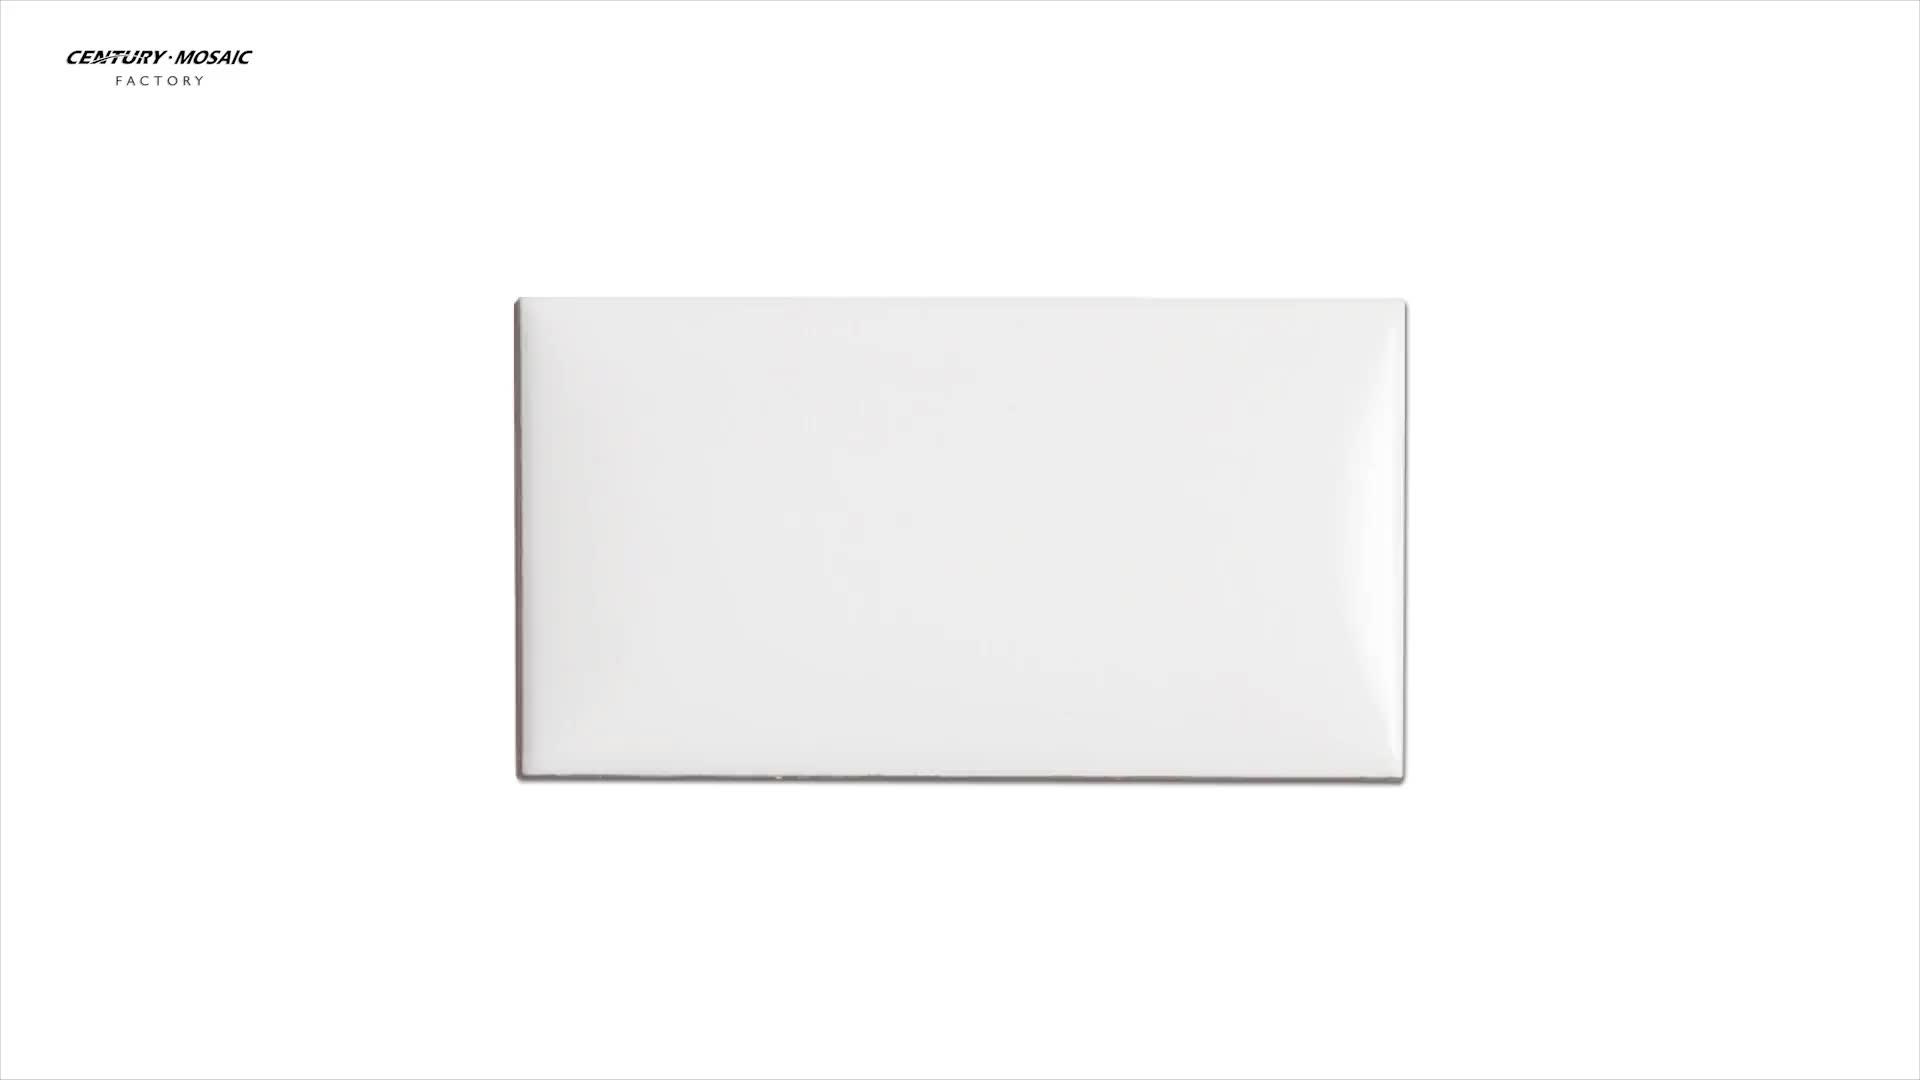 Century Factory Price Super White 3''x6'' Beveled Ceramic Tile